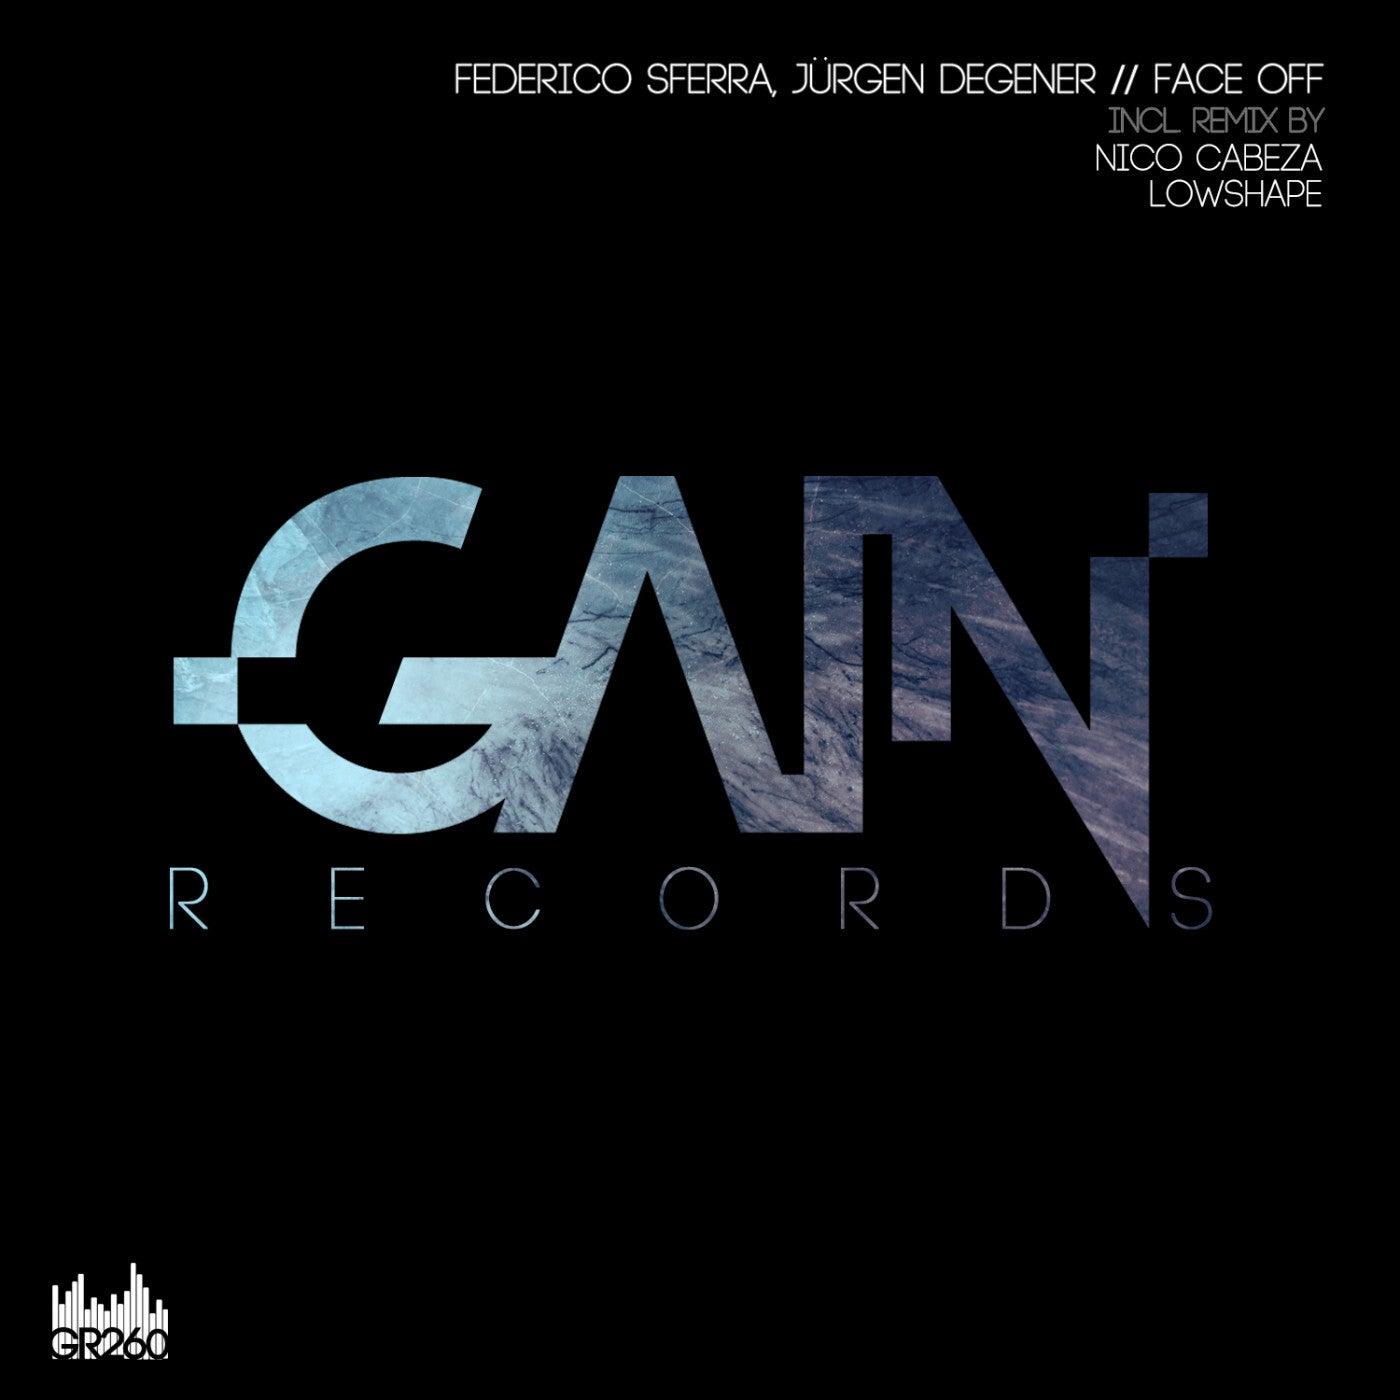 Face Off (Lowshape Remix)